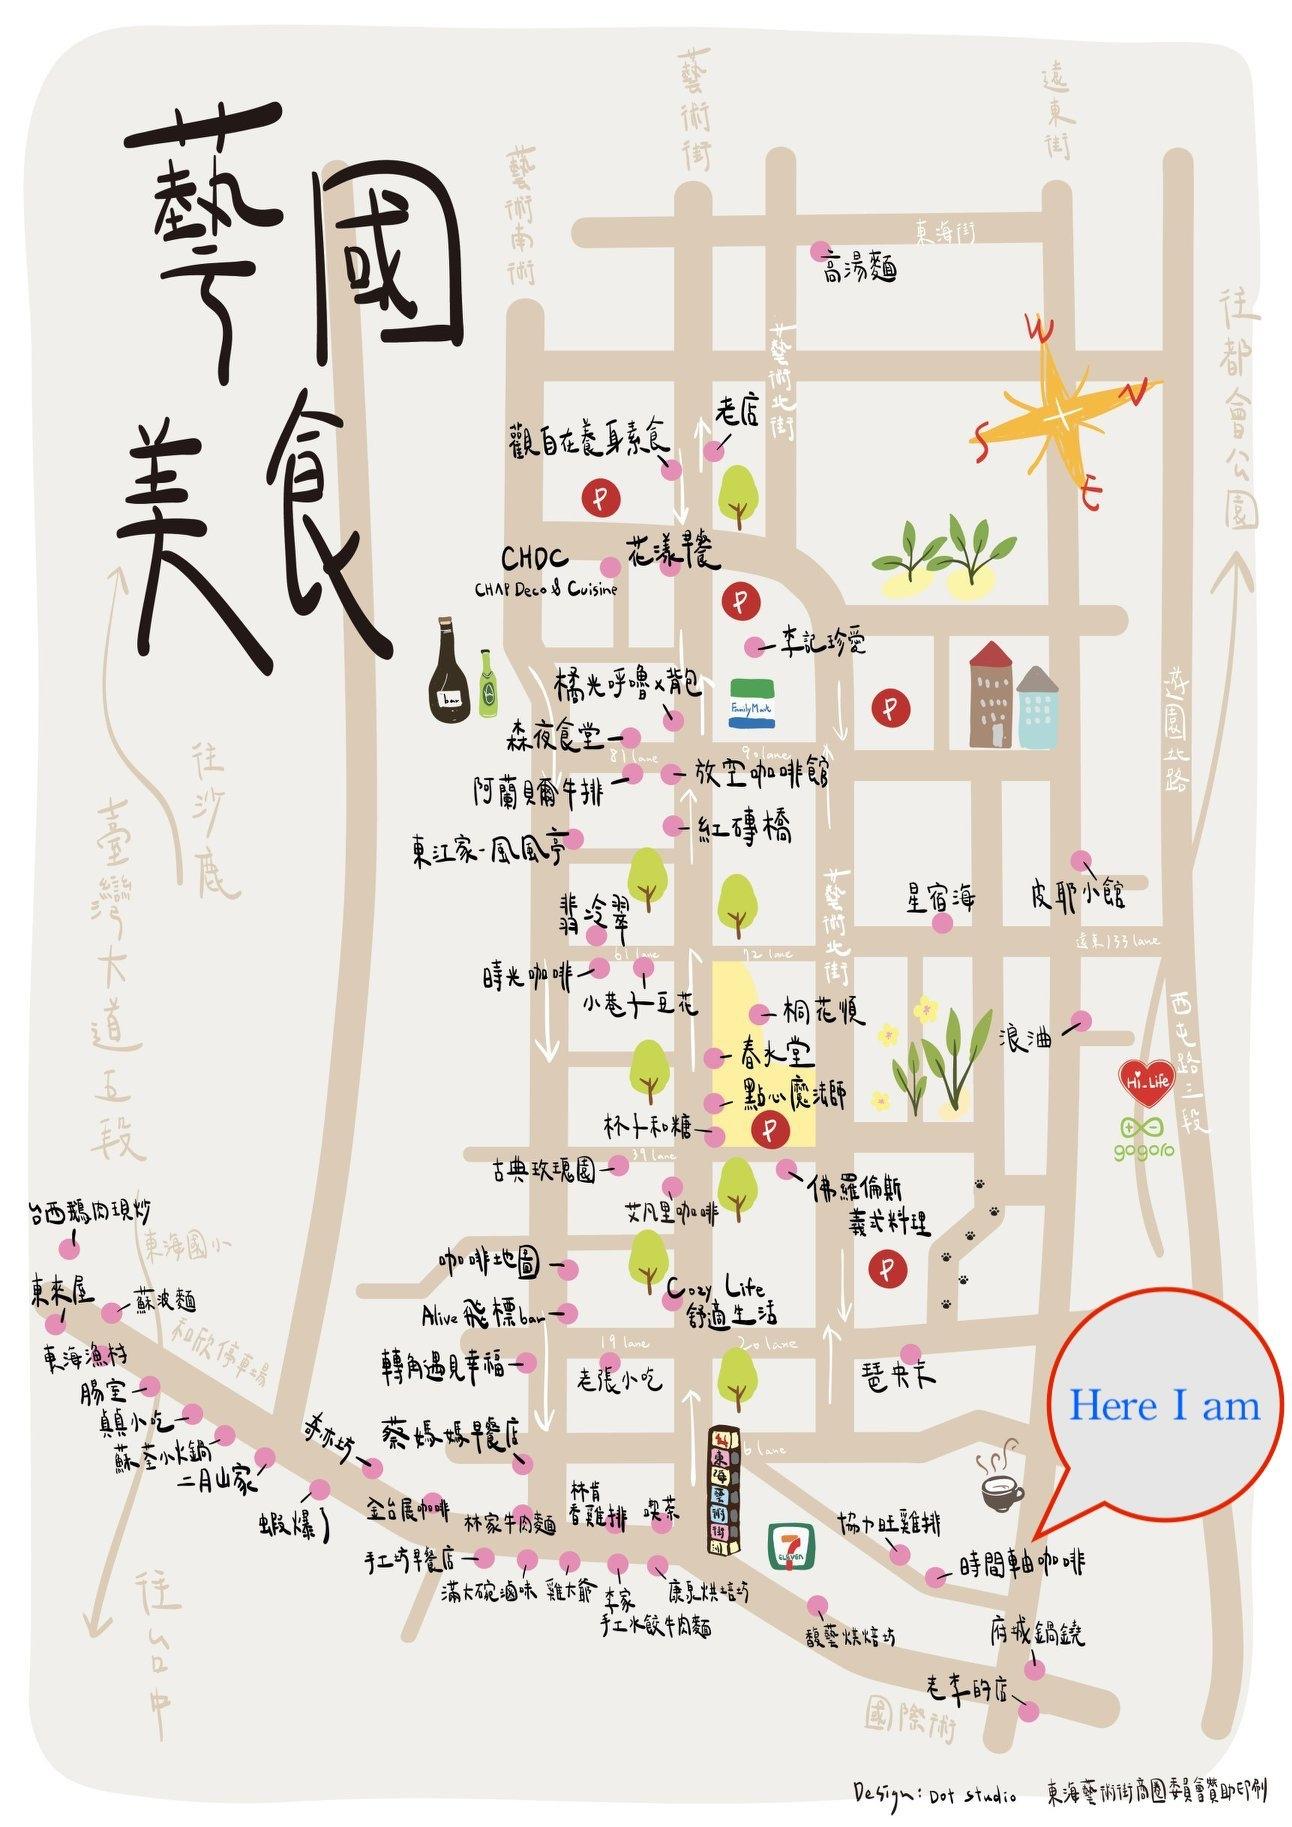 Timeline Cafe Studio時間軸食宿工坊